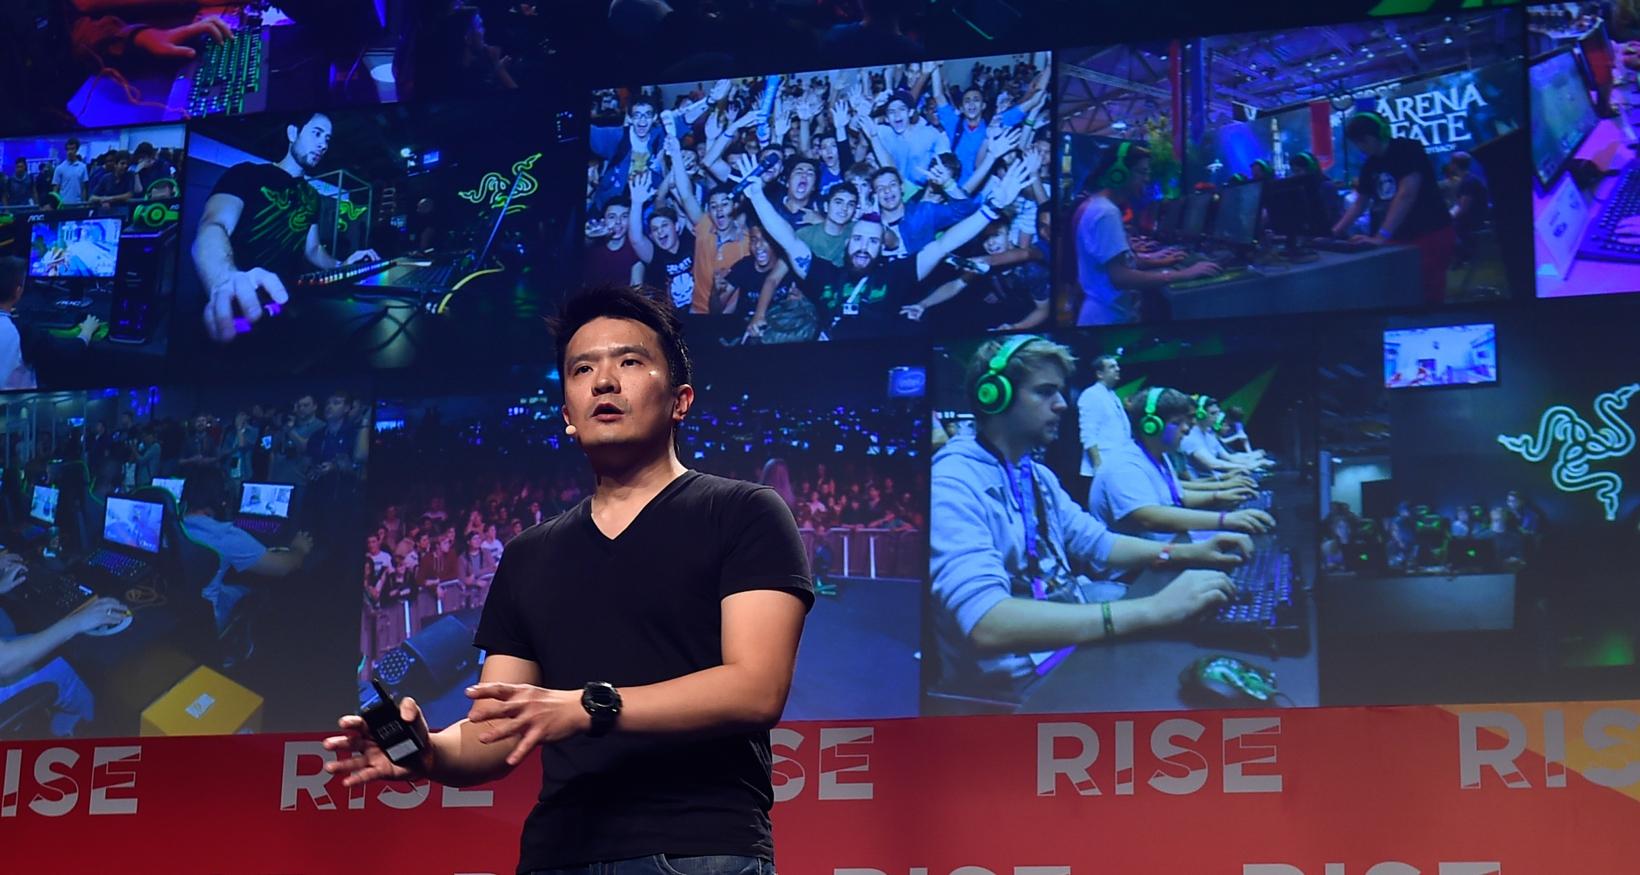 Razer integrates Amazon's Alexa voice controls and haptic feedback